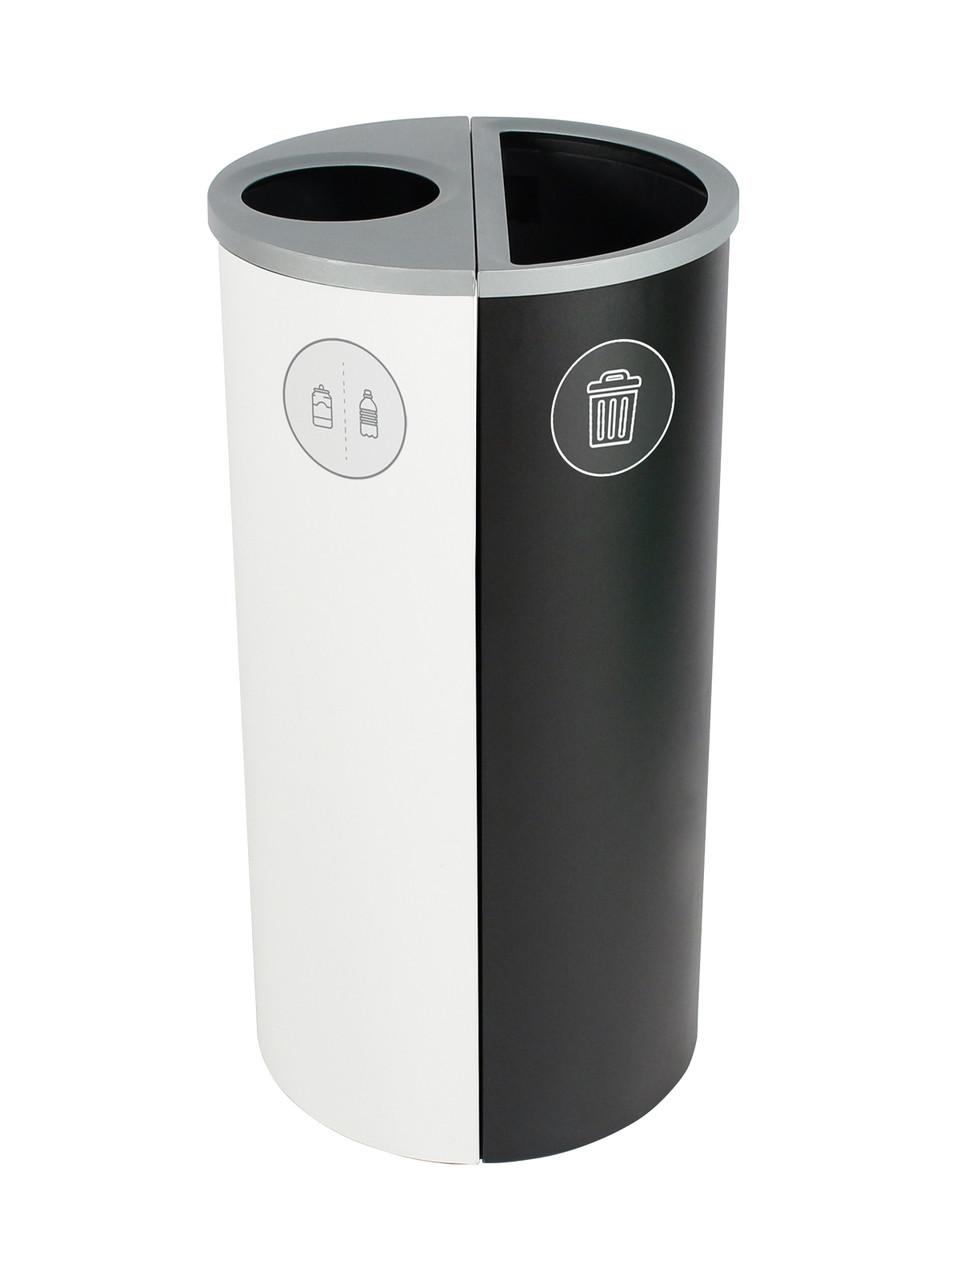 16 Gallon Spectrum Round Trash Can & Recycle Bin White/Black 8107085-14